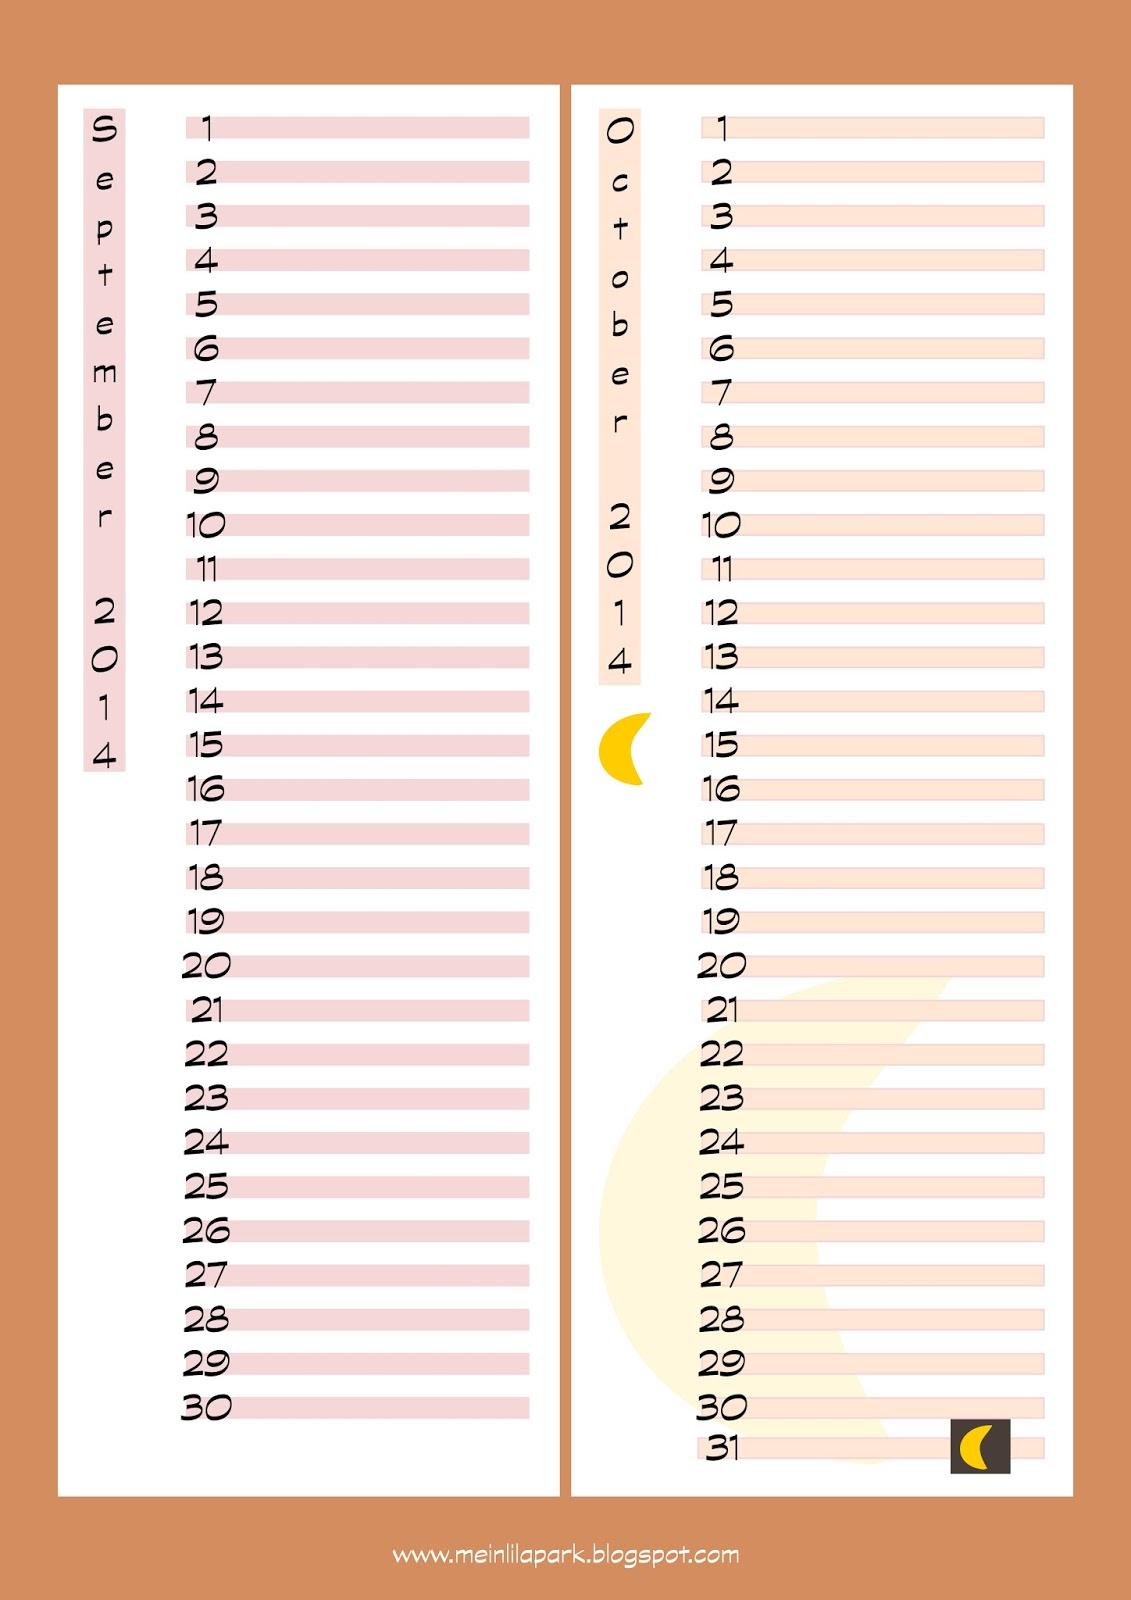 Free printable 2014 calendar planners - ausdruckbare Kalender ...